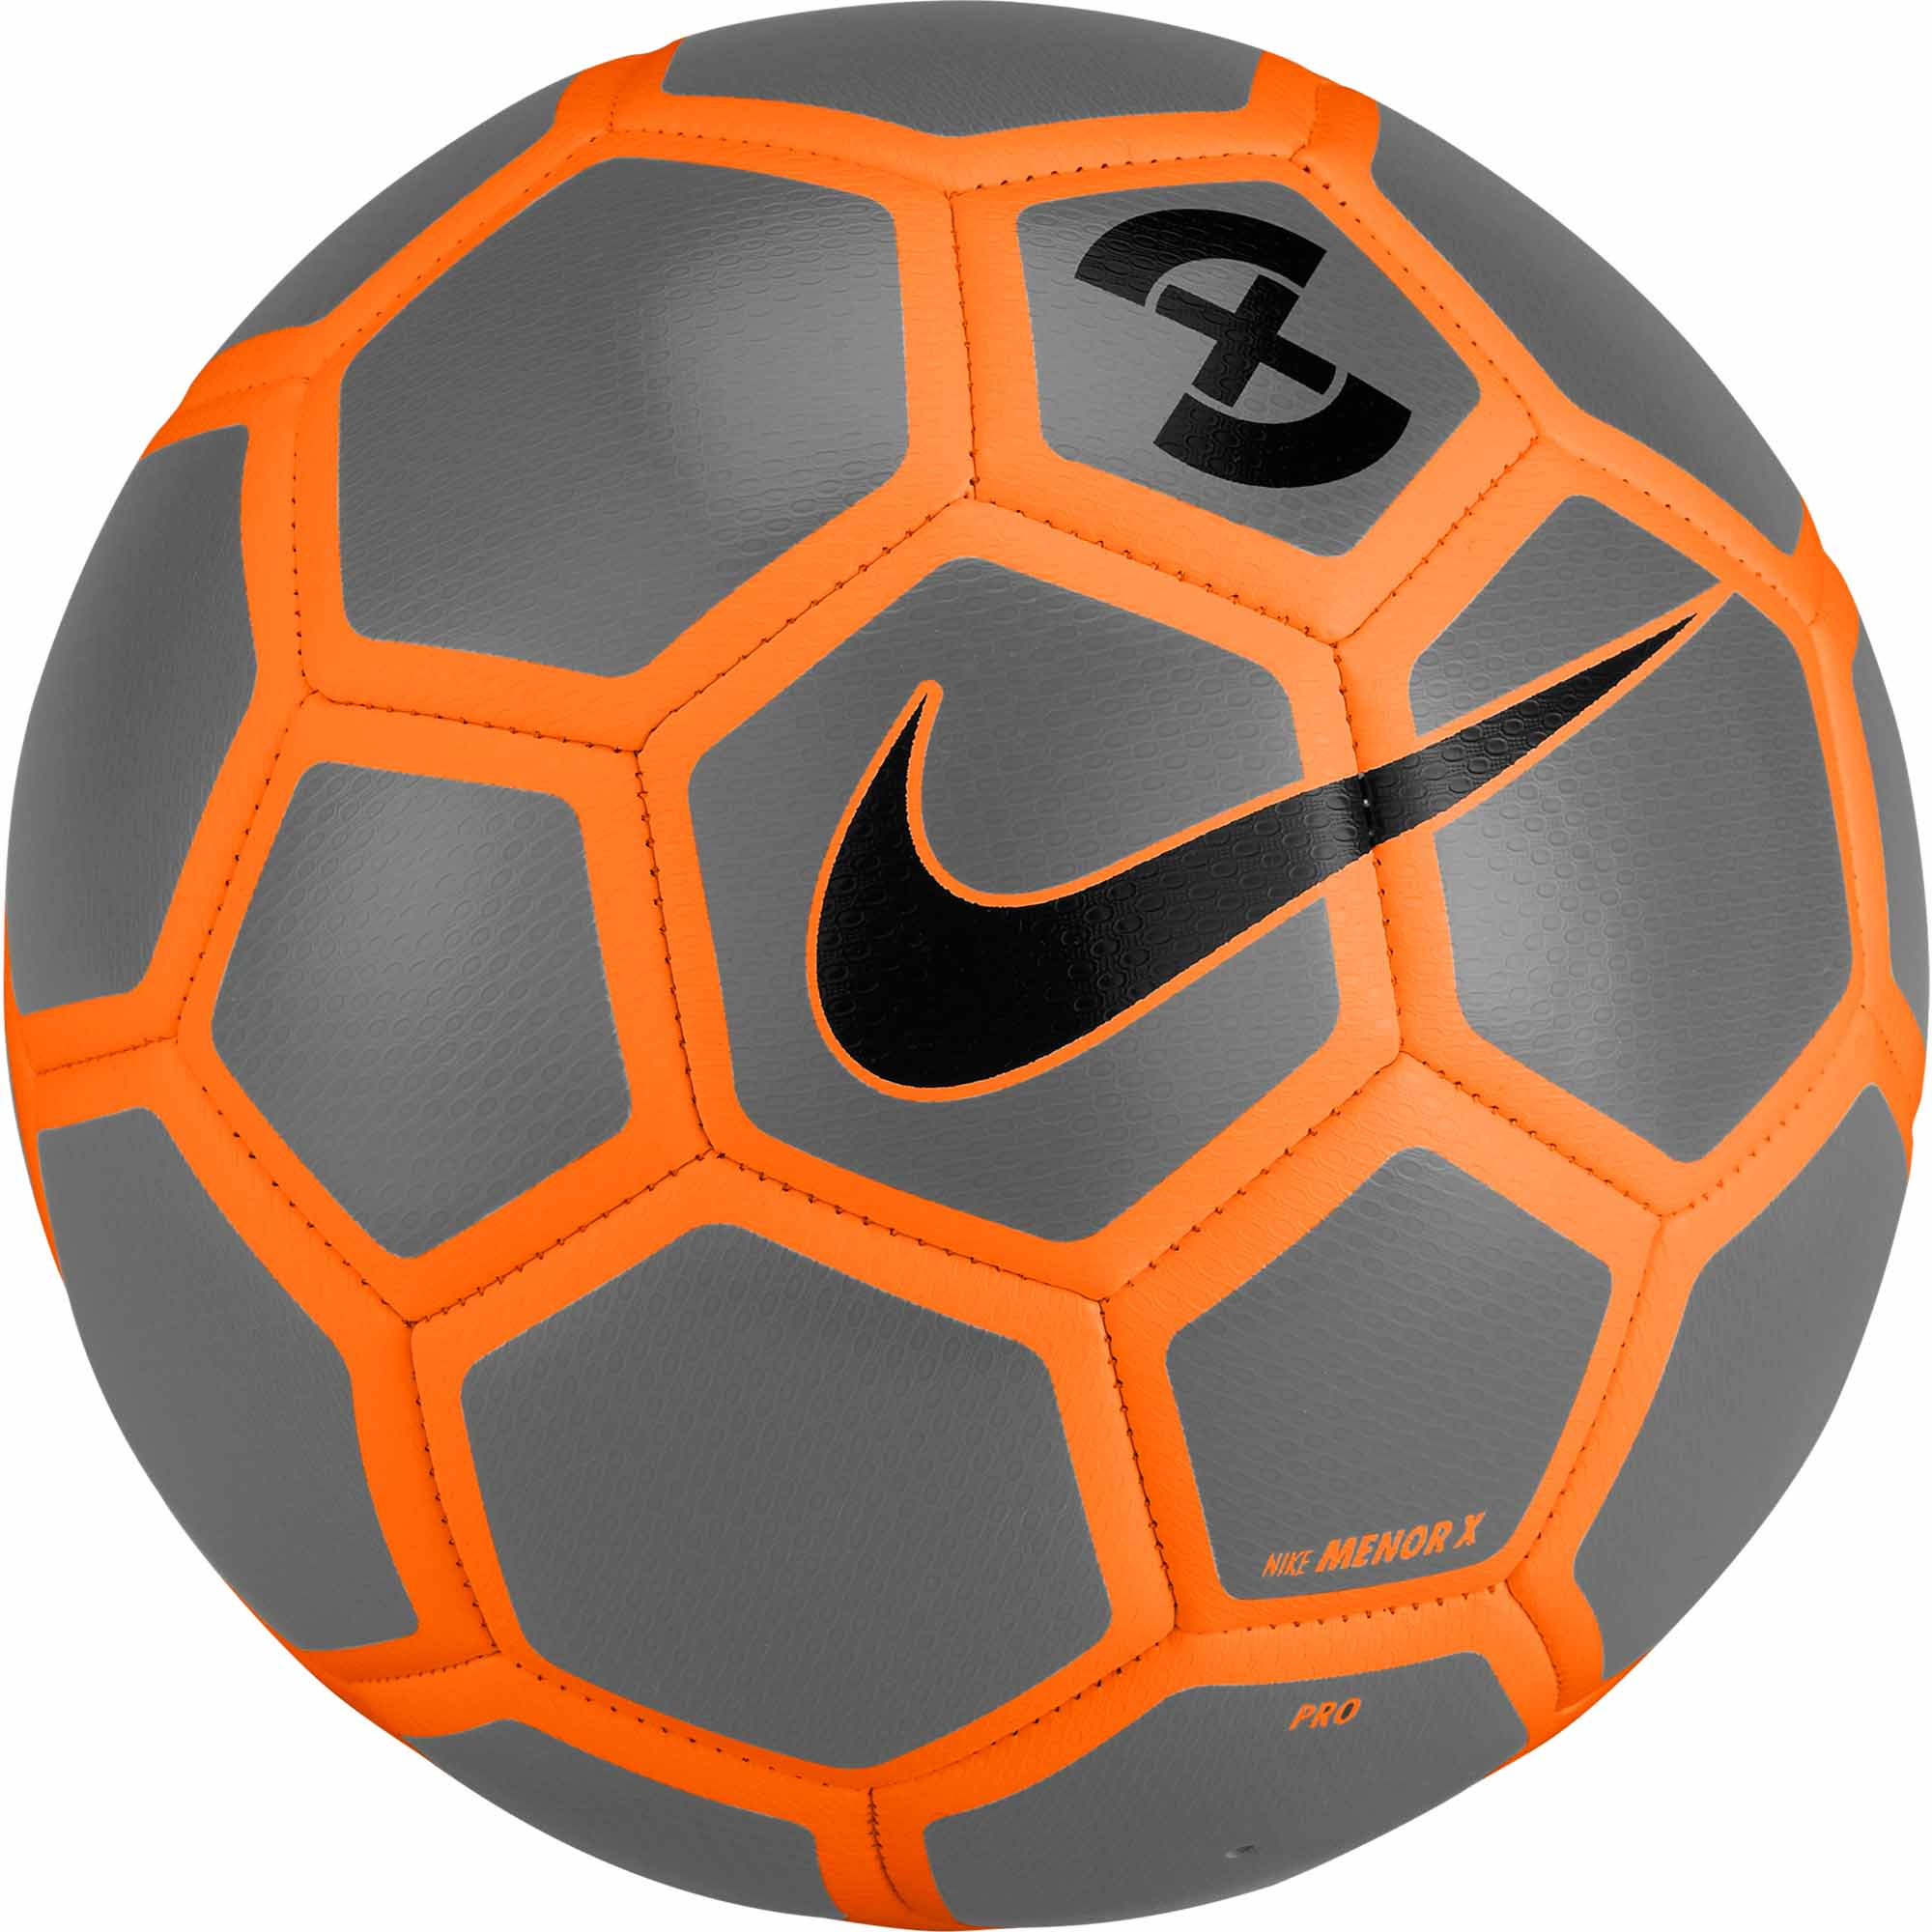 3315df6d5a Nike Menor X Futsal Ball - Grey Nike Soccer Balls